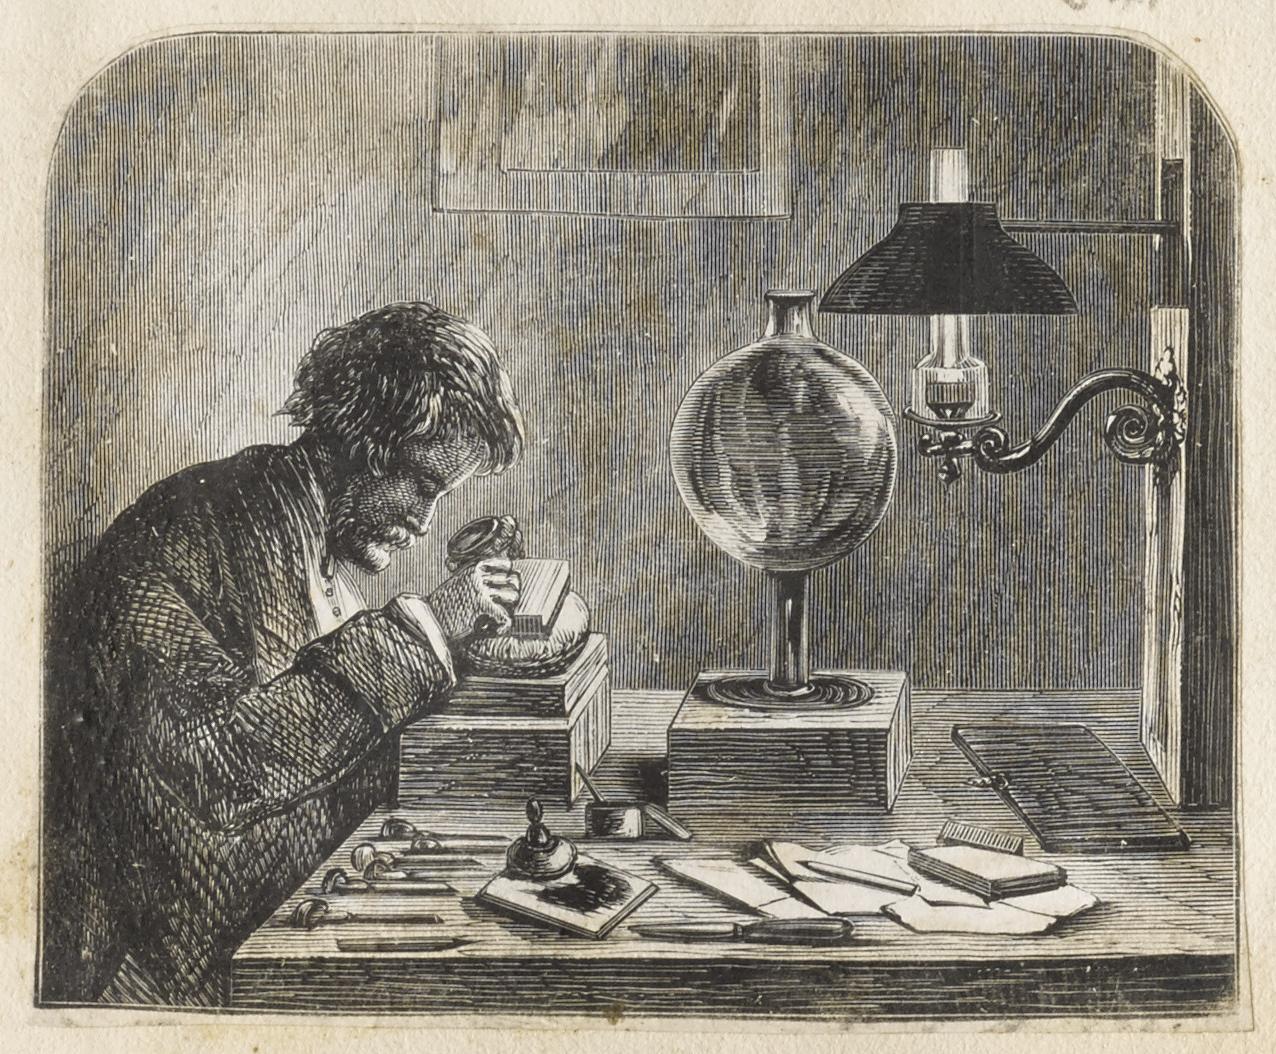 Wood Engraver, Dalziel Brothers